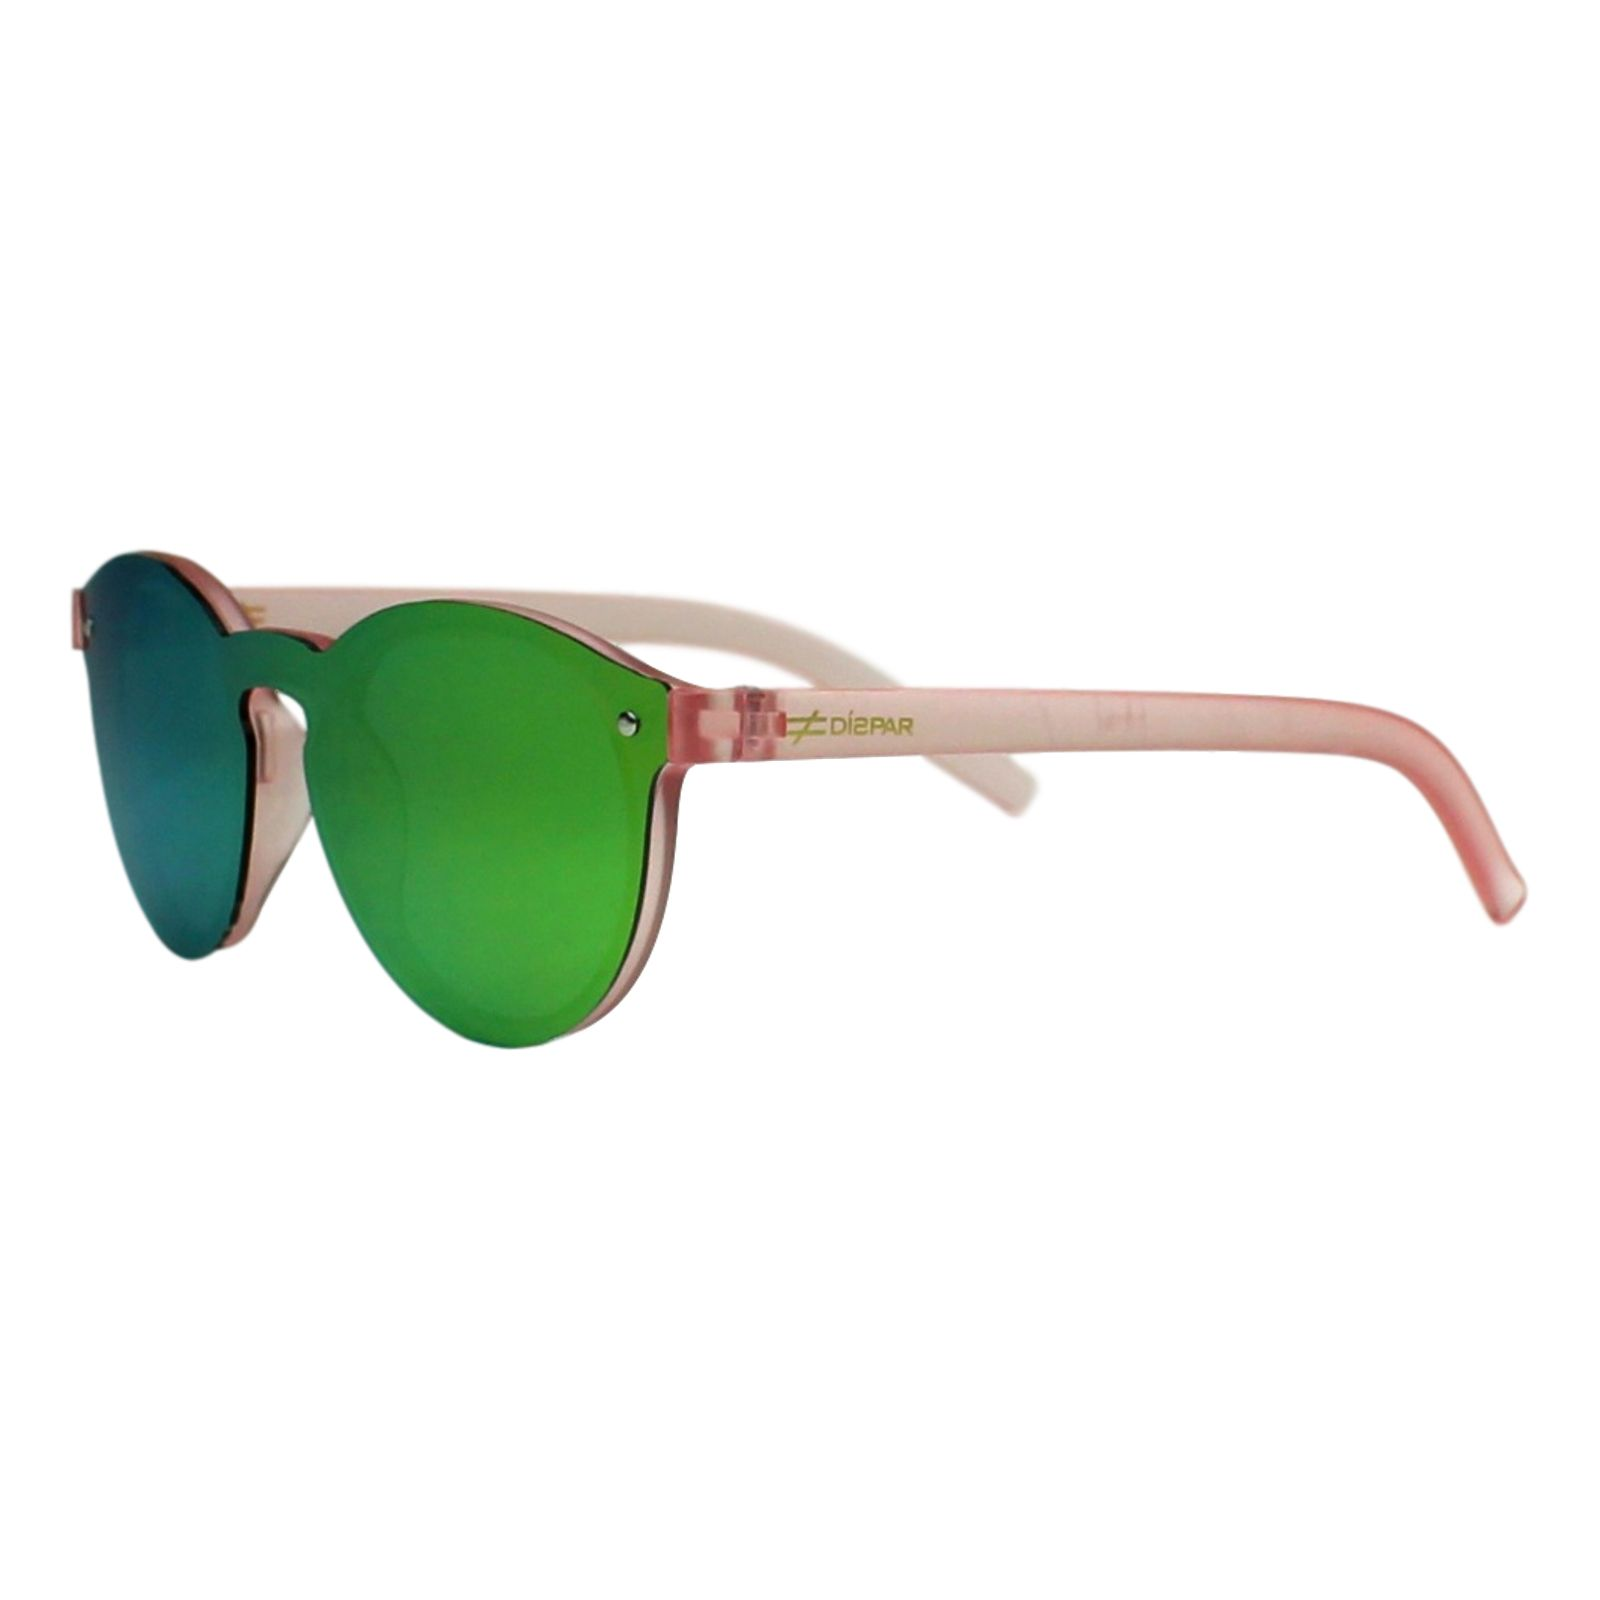 Óculos de Sol Díspar ID1897 infantil idade 6 a 9 anos Rosa